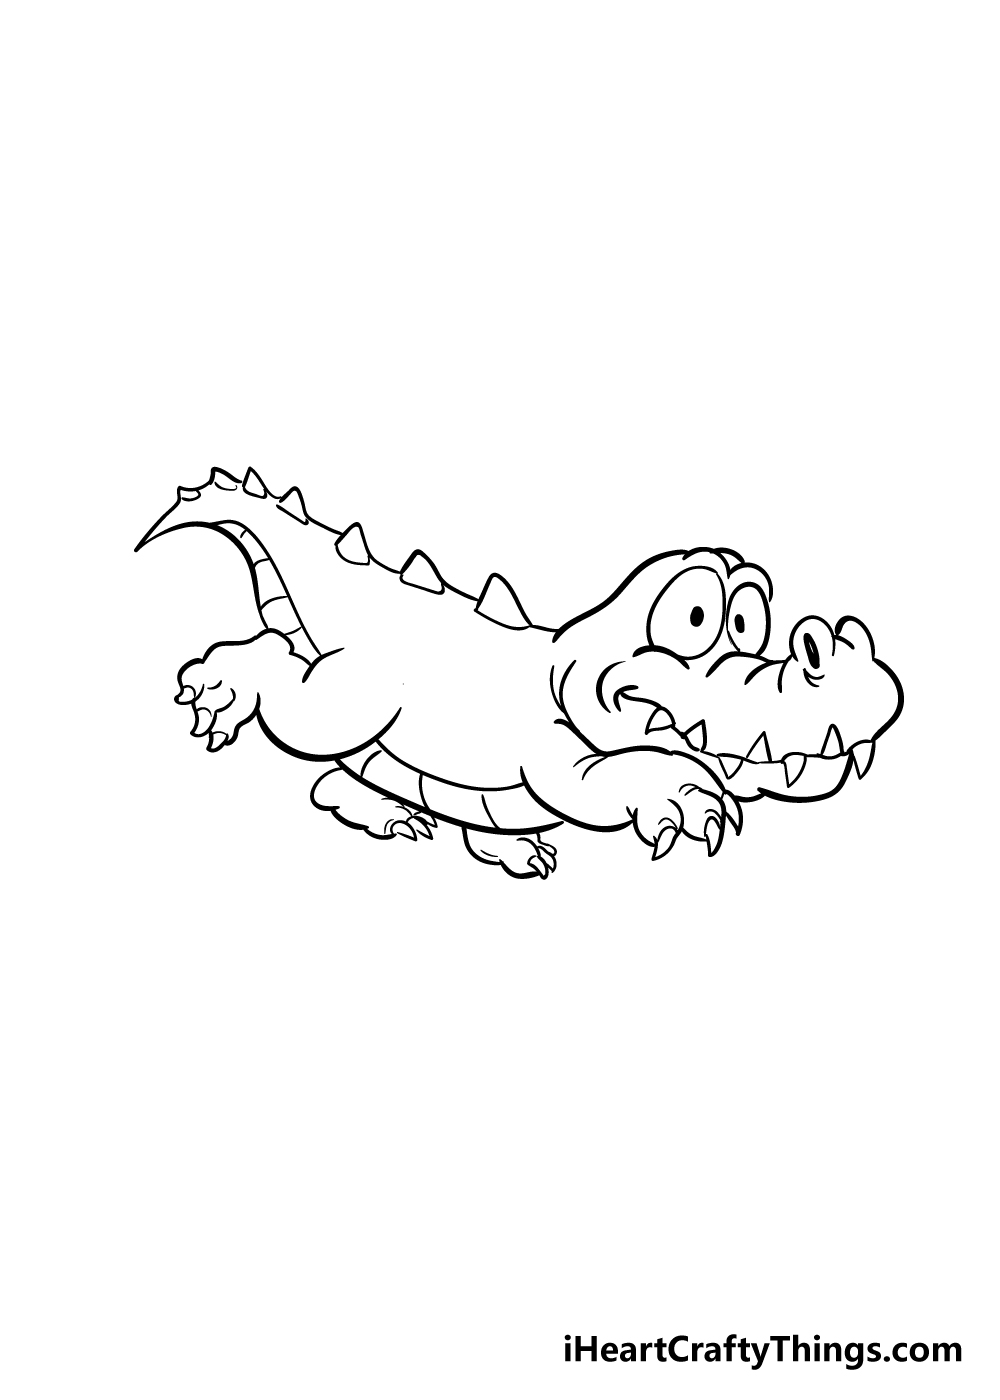 crocodile drawing step 6